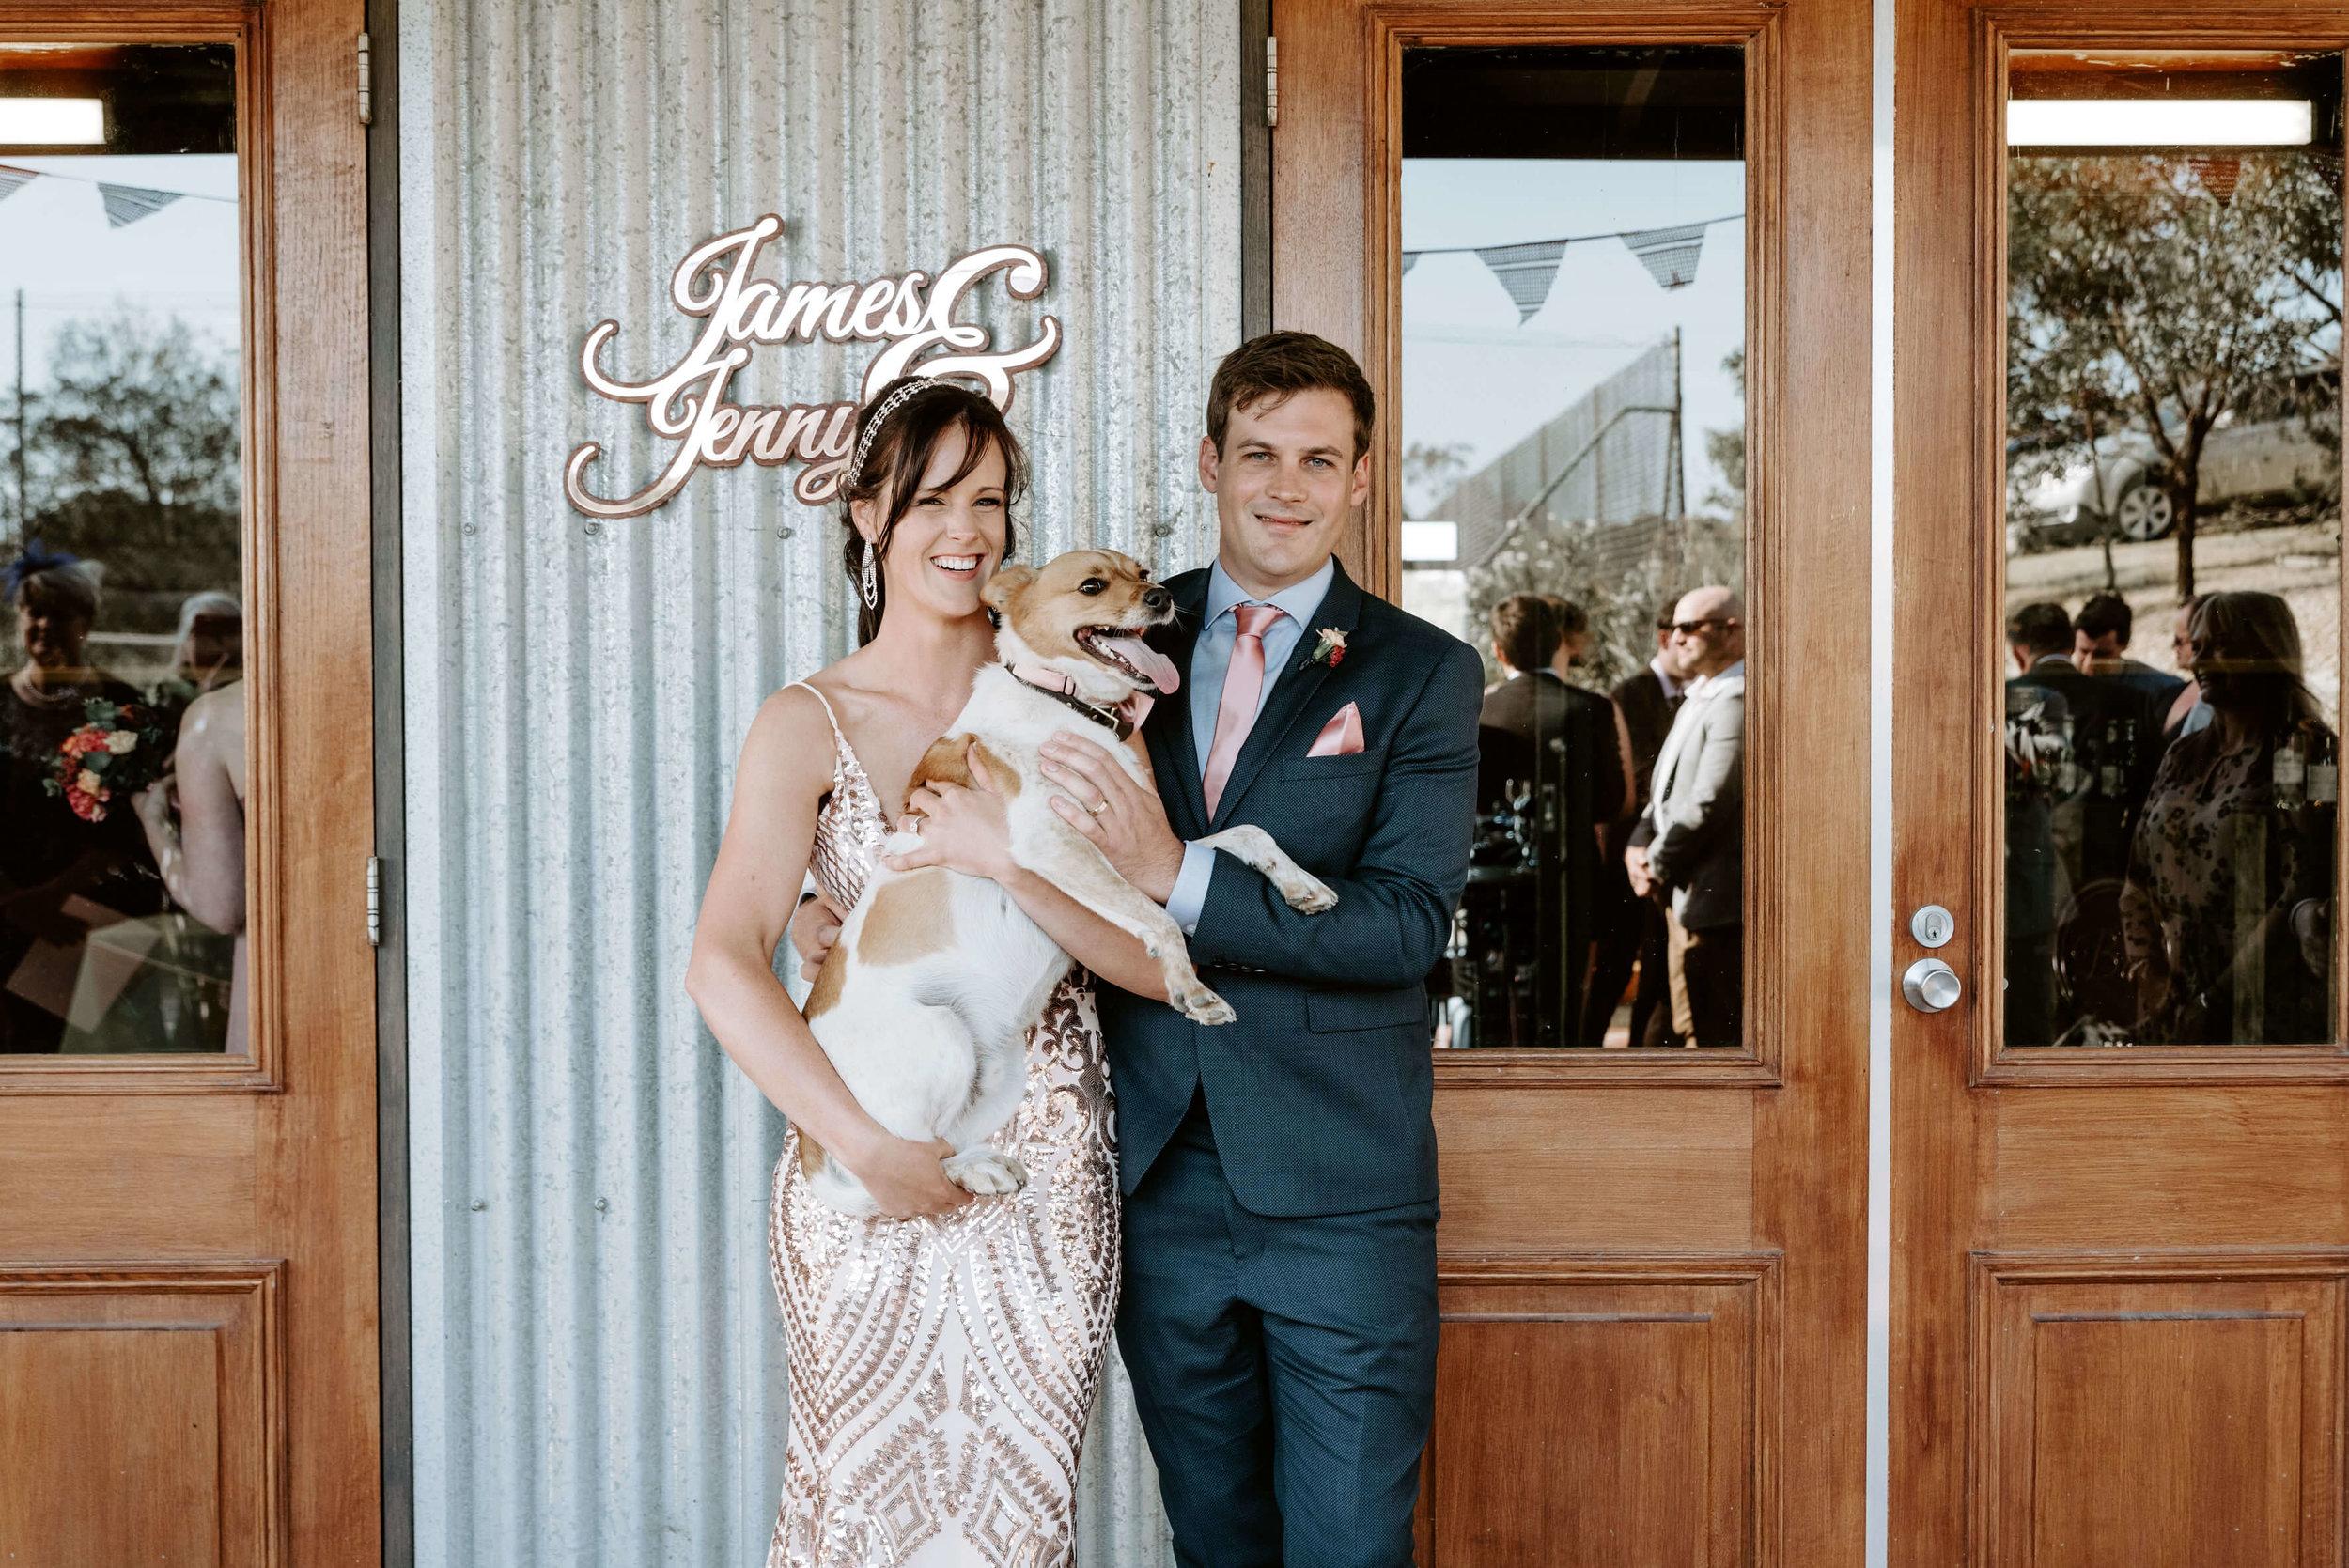 Jenny&James-283.jpg